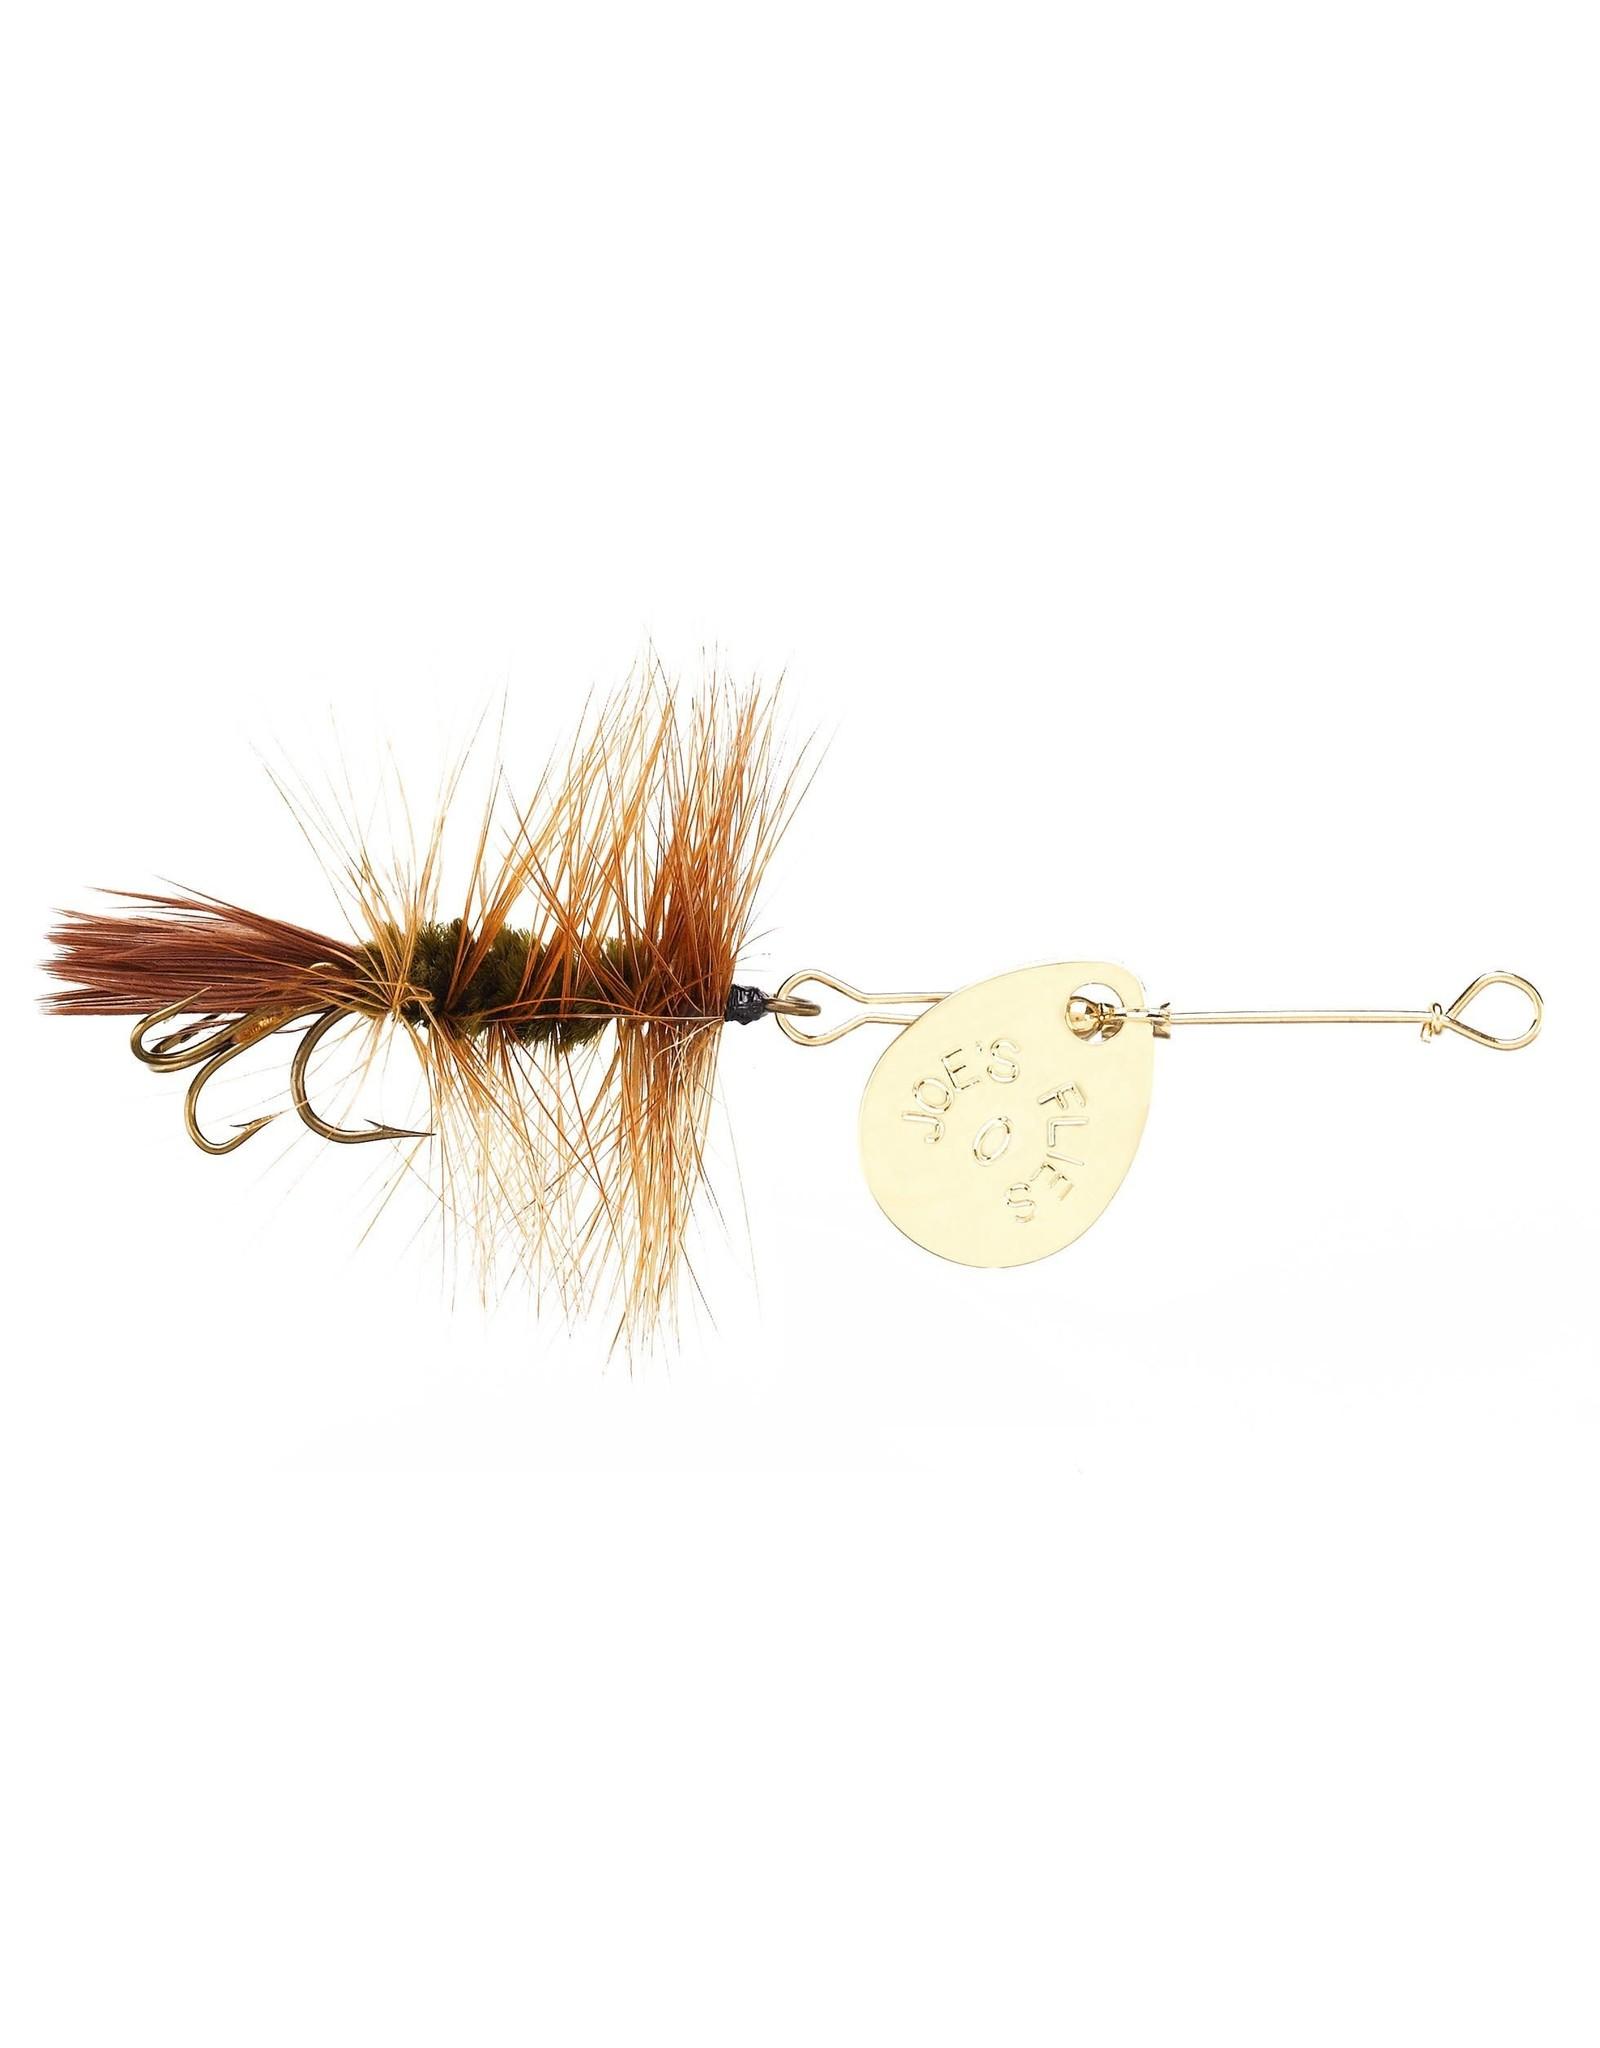 Joe's Flies Joe's Flies Short Striker - Size 10